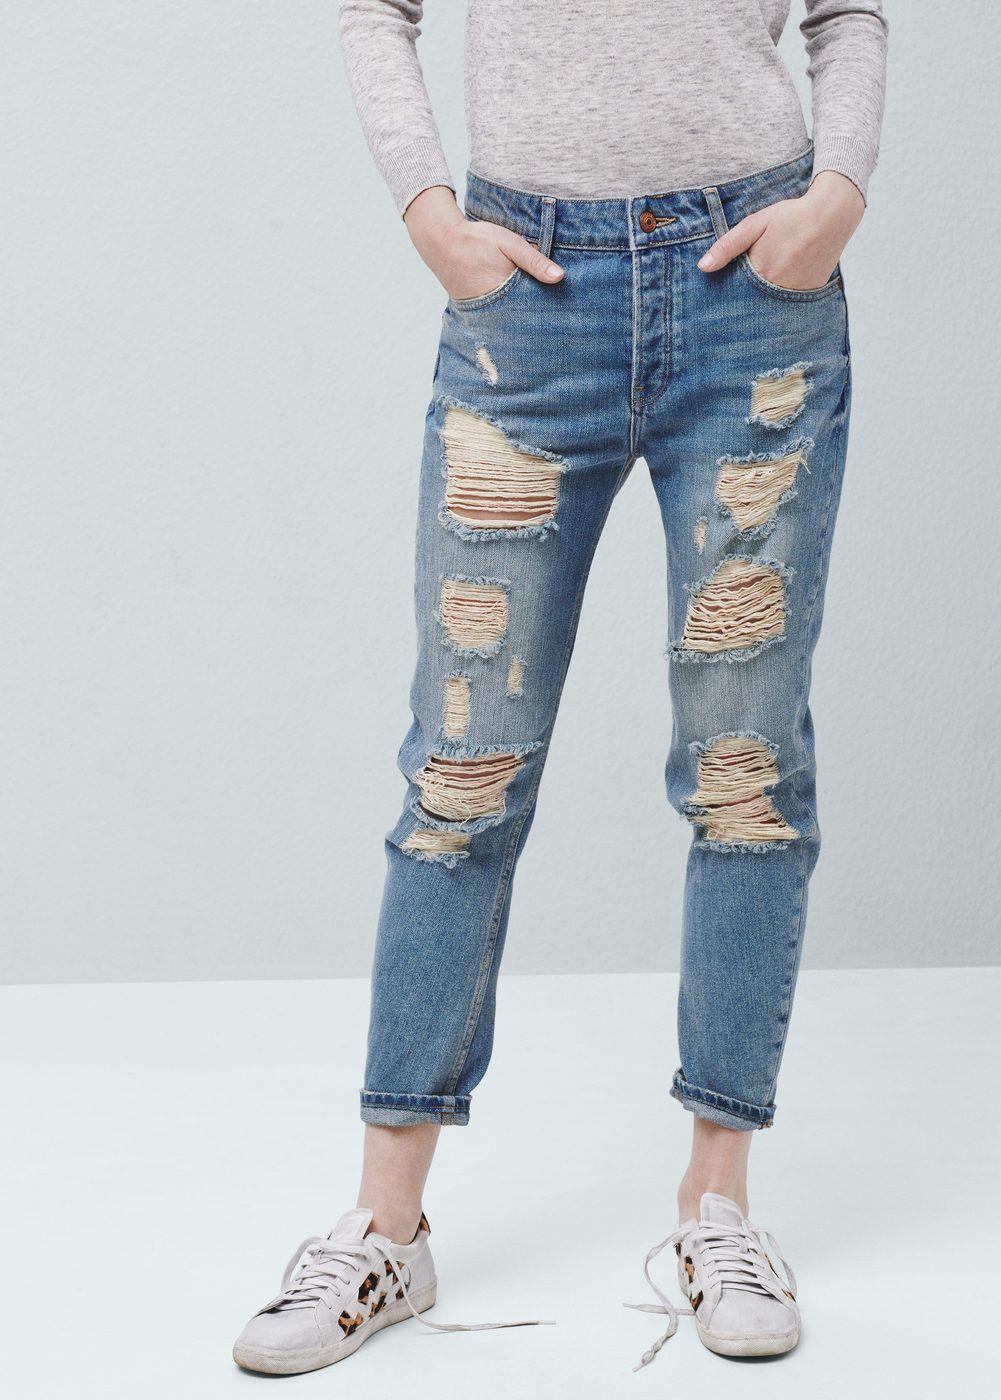 024a2020f6c Boyfriend angie jeans - Jeans for Women